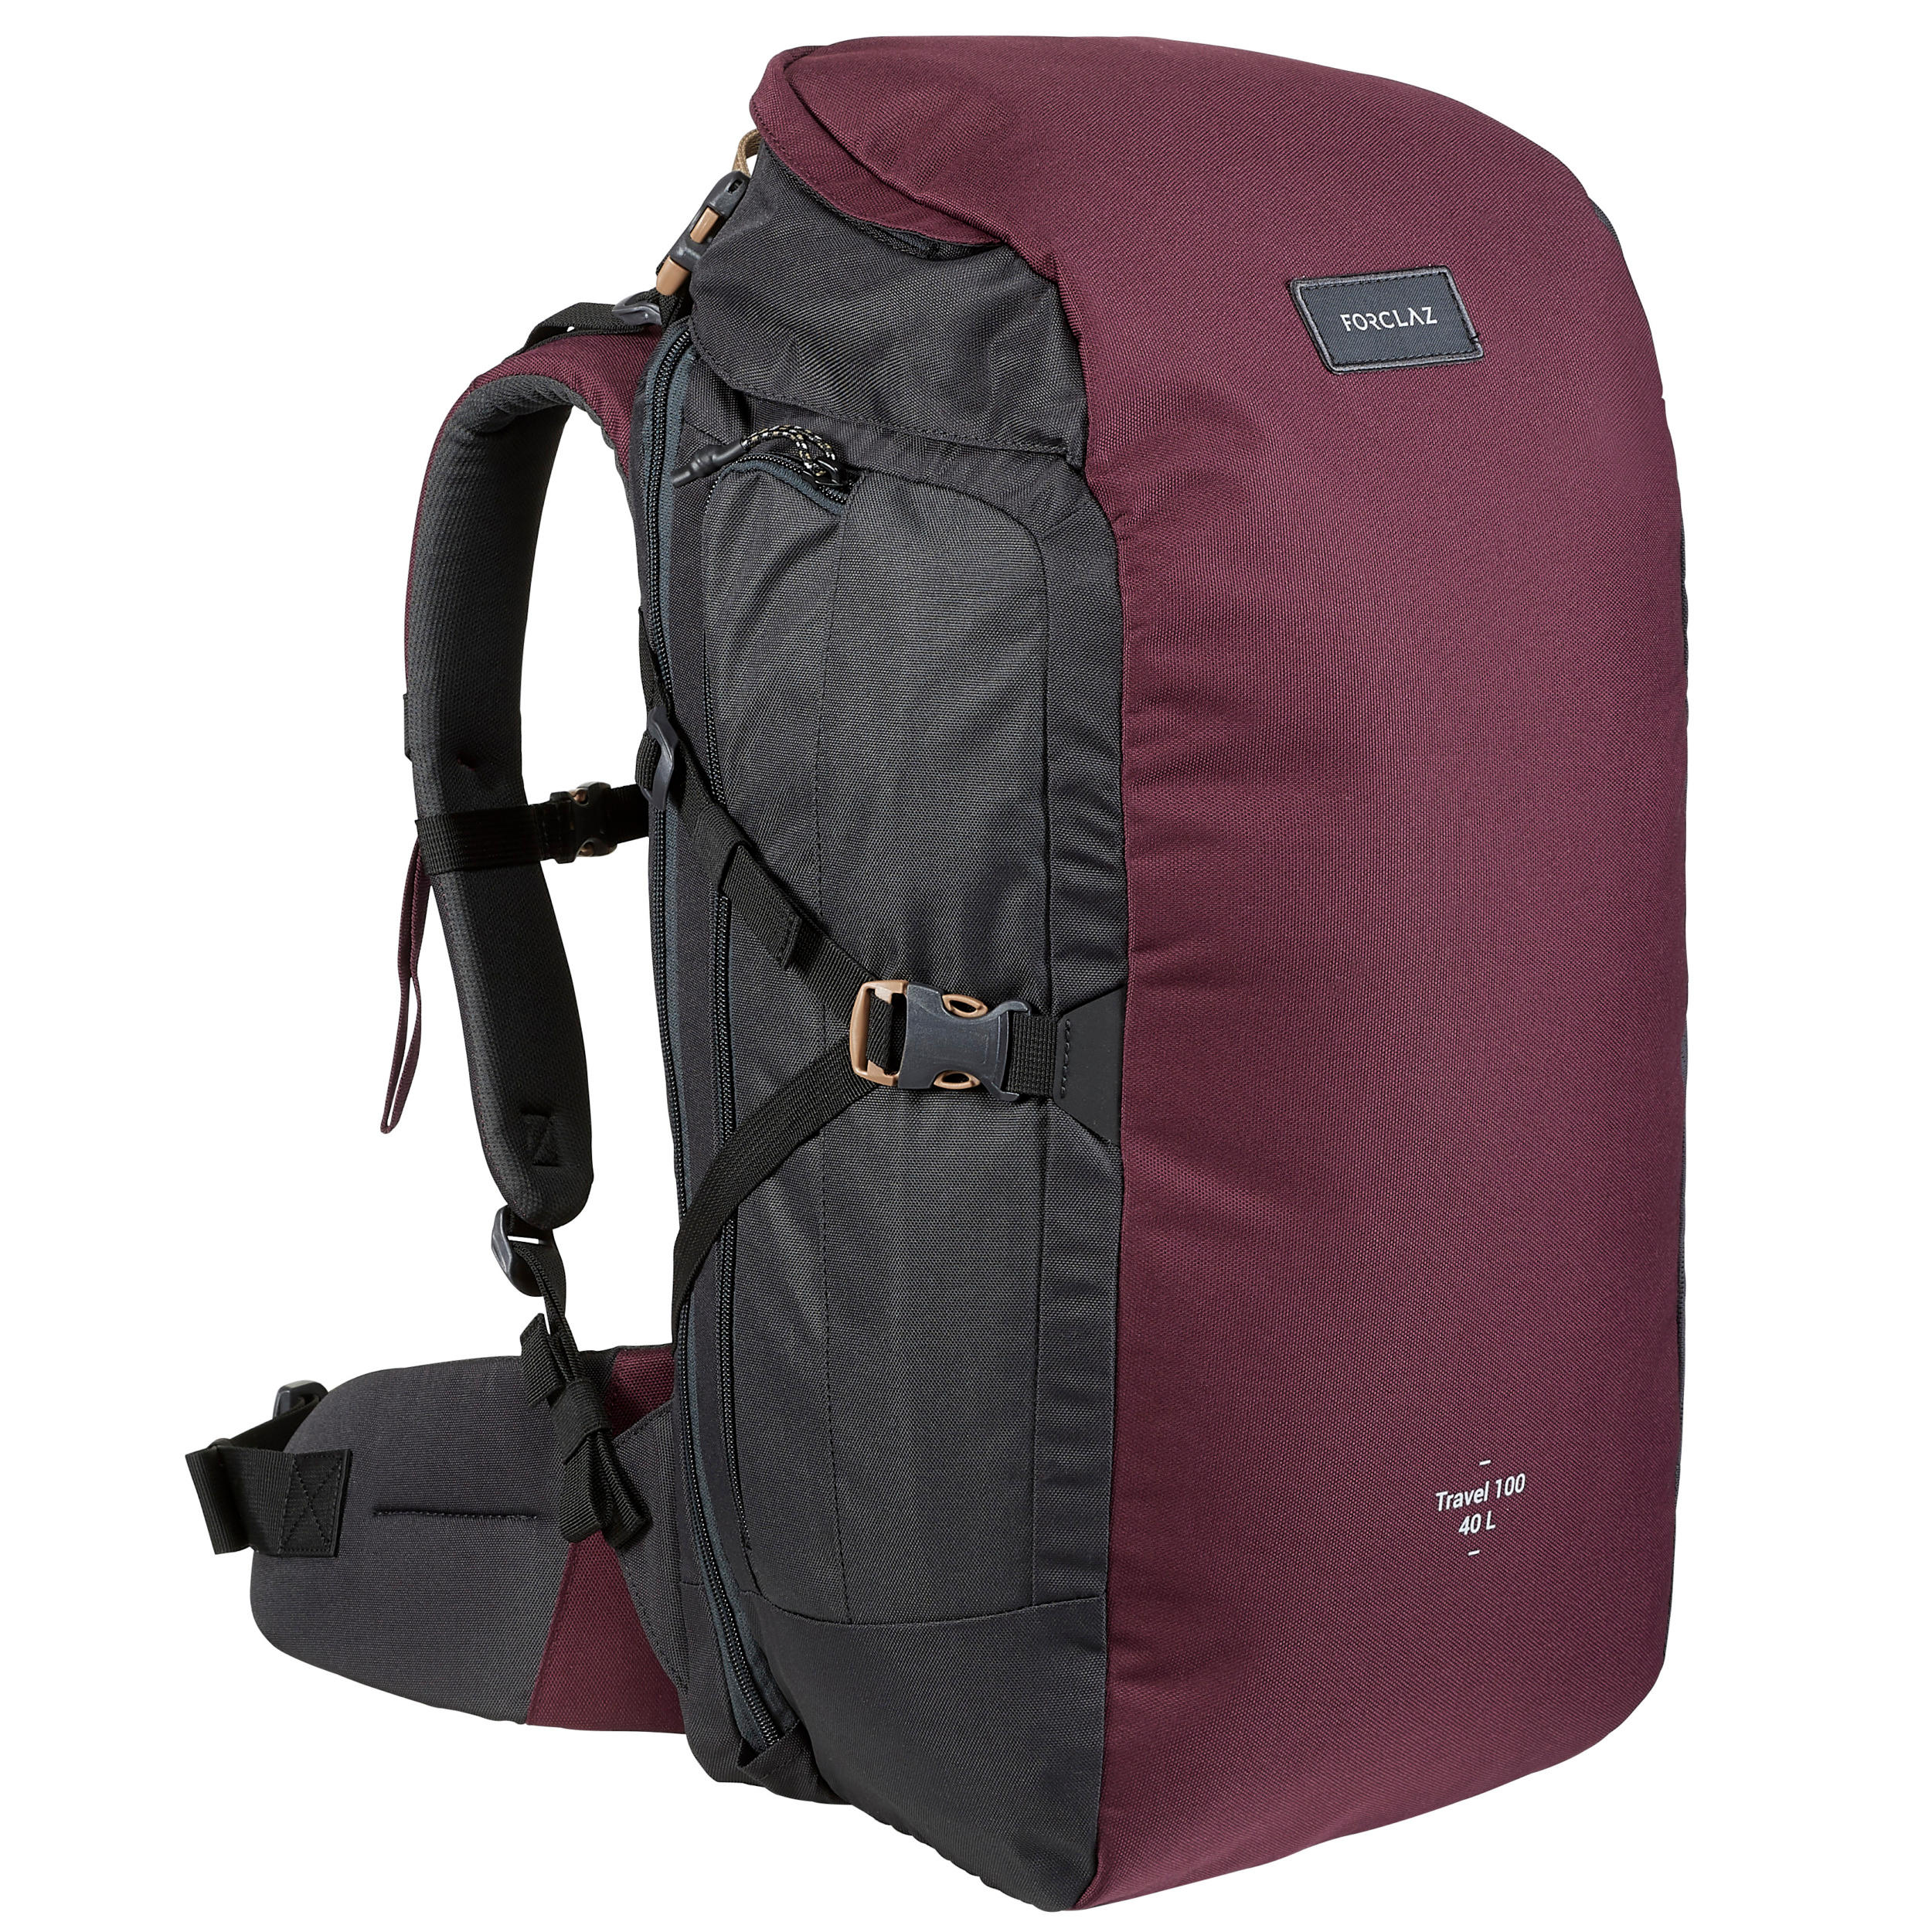 Forclaz Travel 100 40L